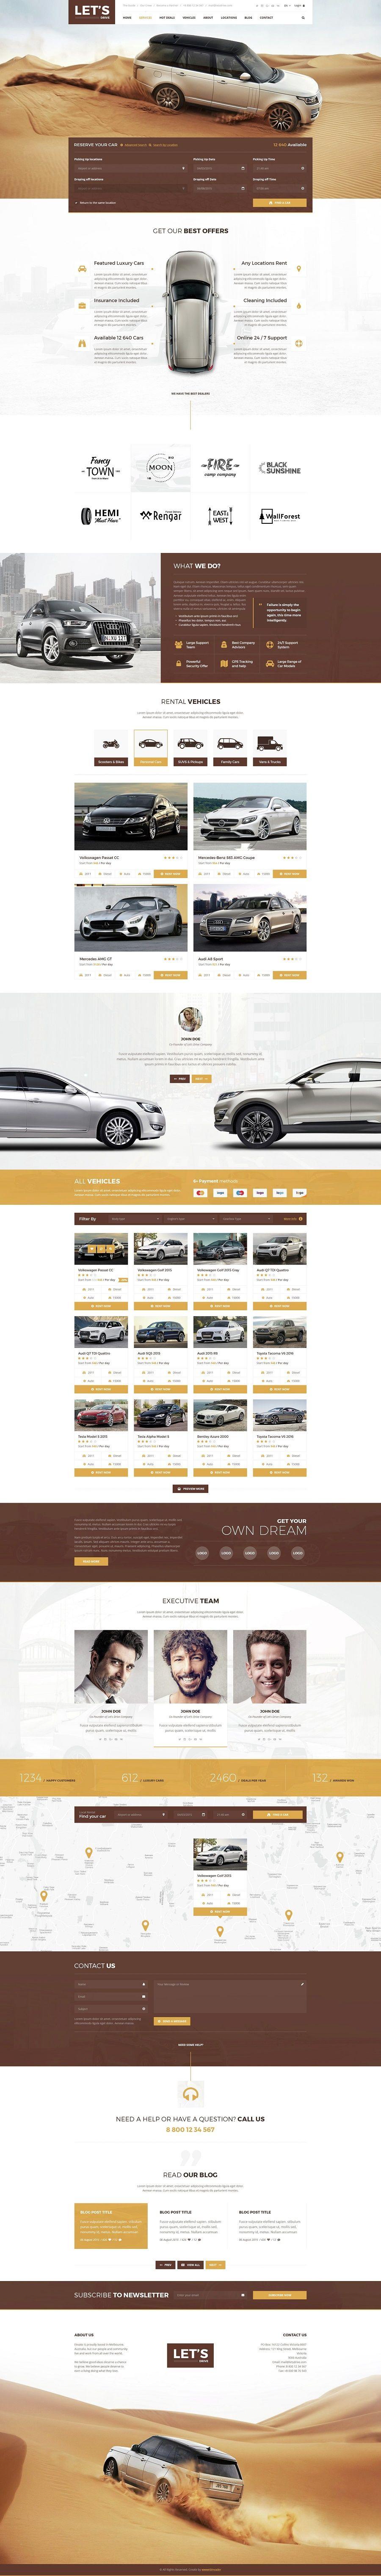 Best Business Themes #WEB #DESIGN   Landing Page Design ...